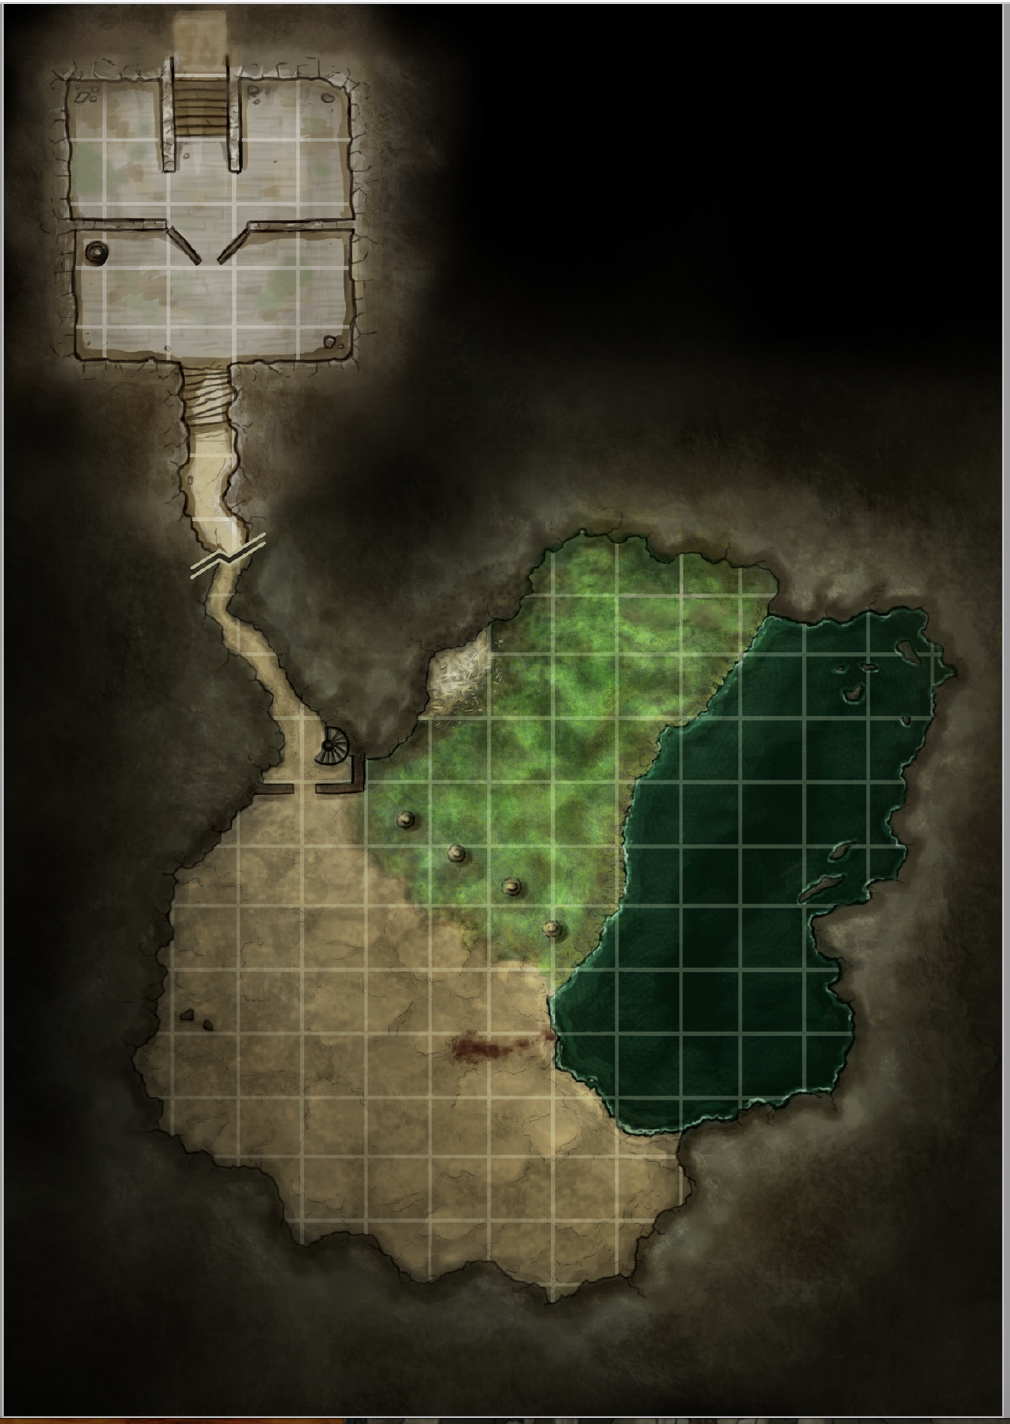 F_rmak_grotta.png